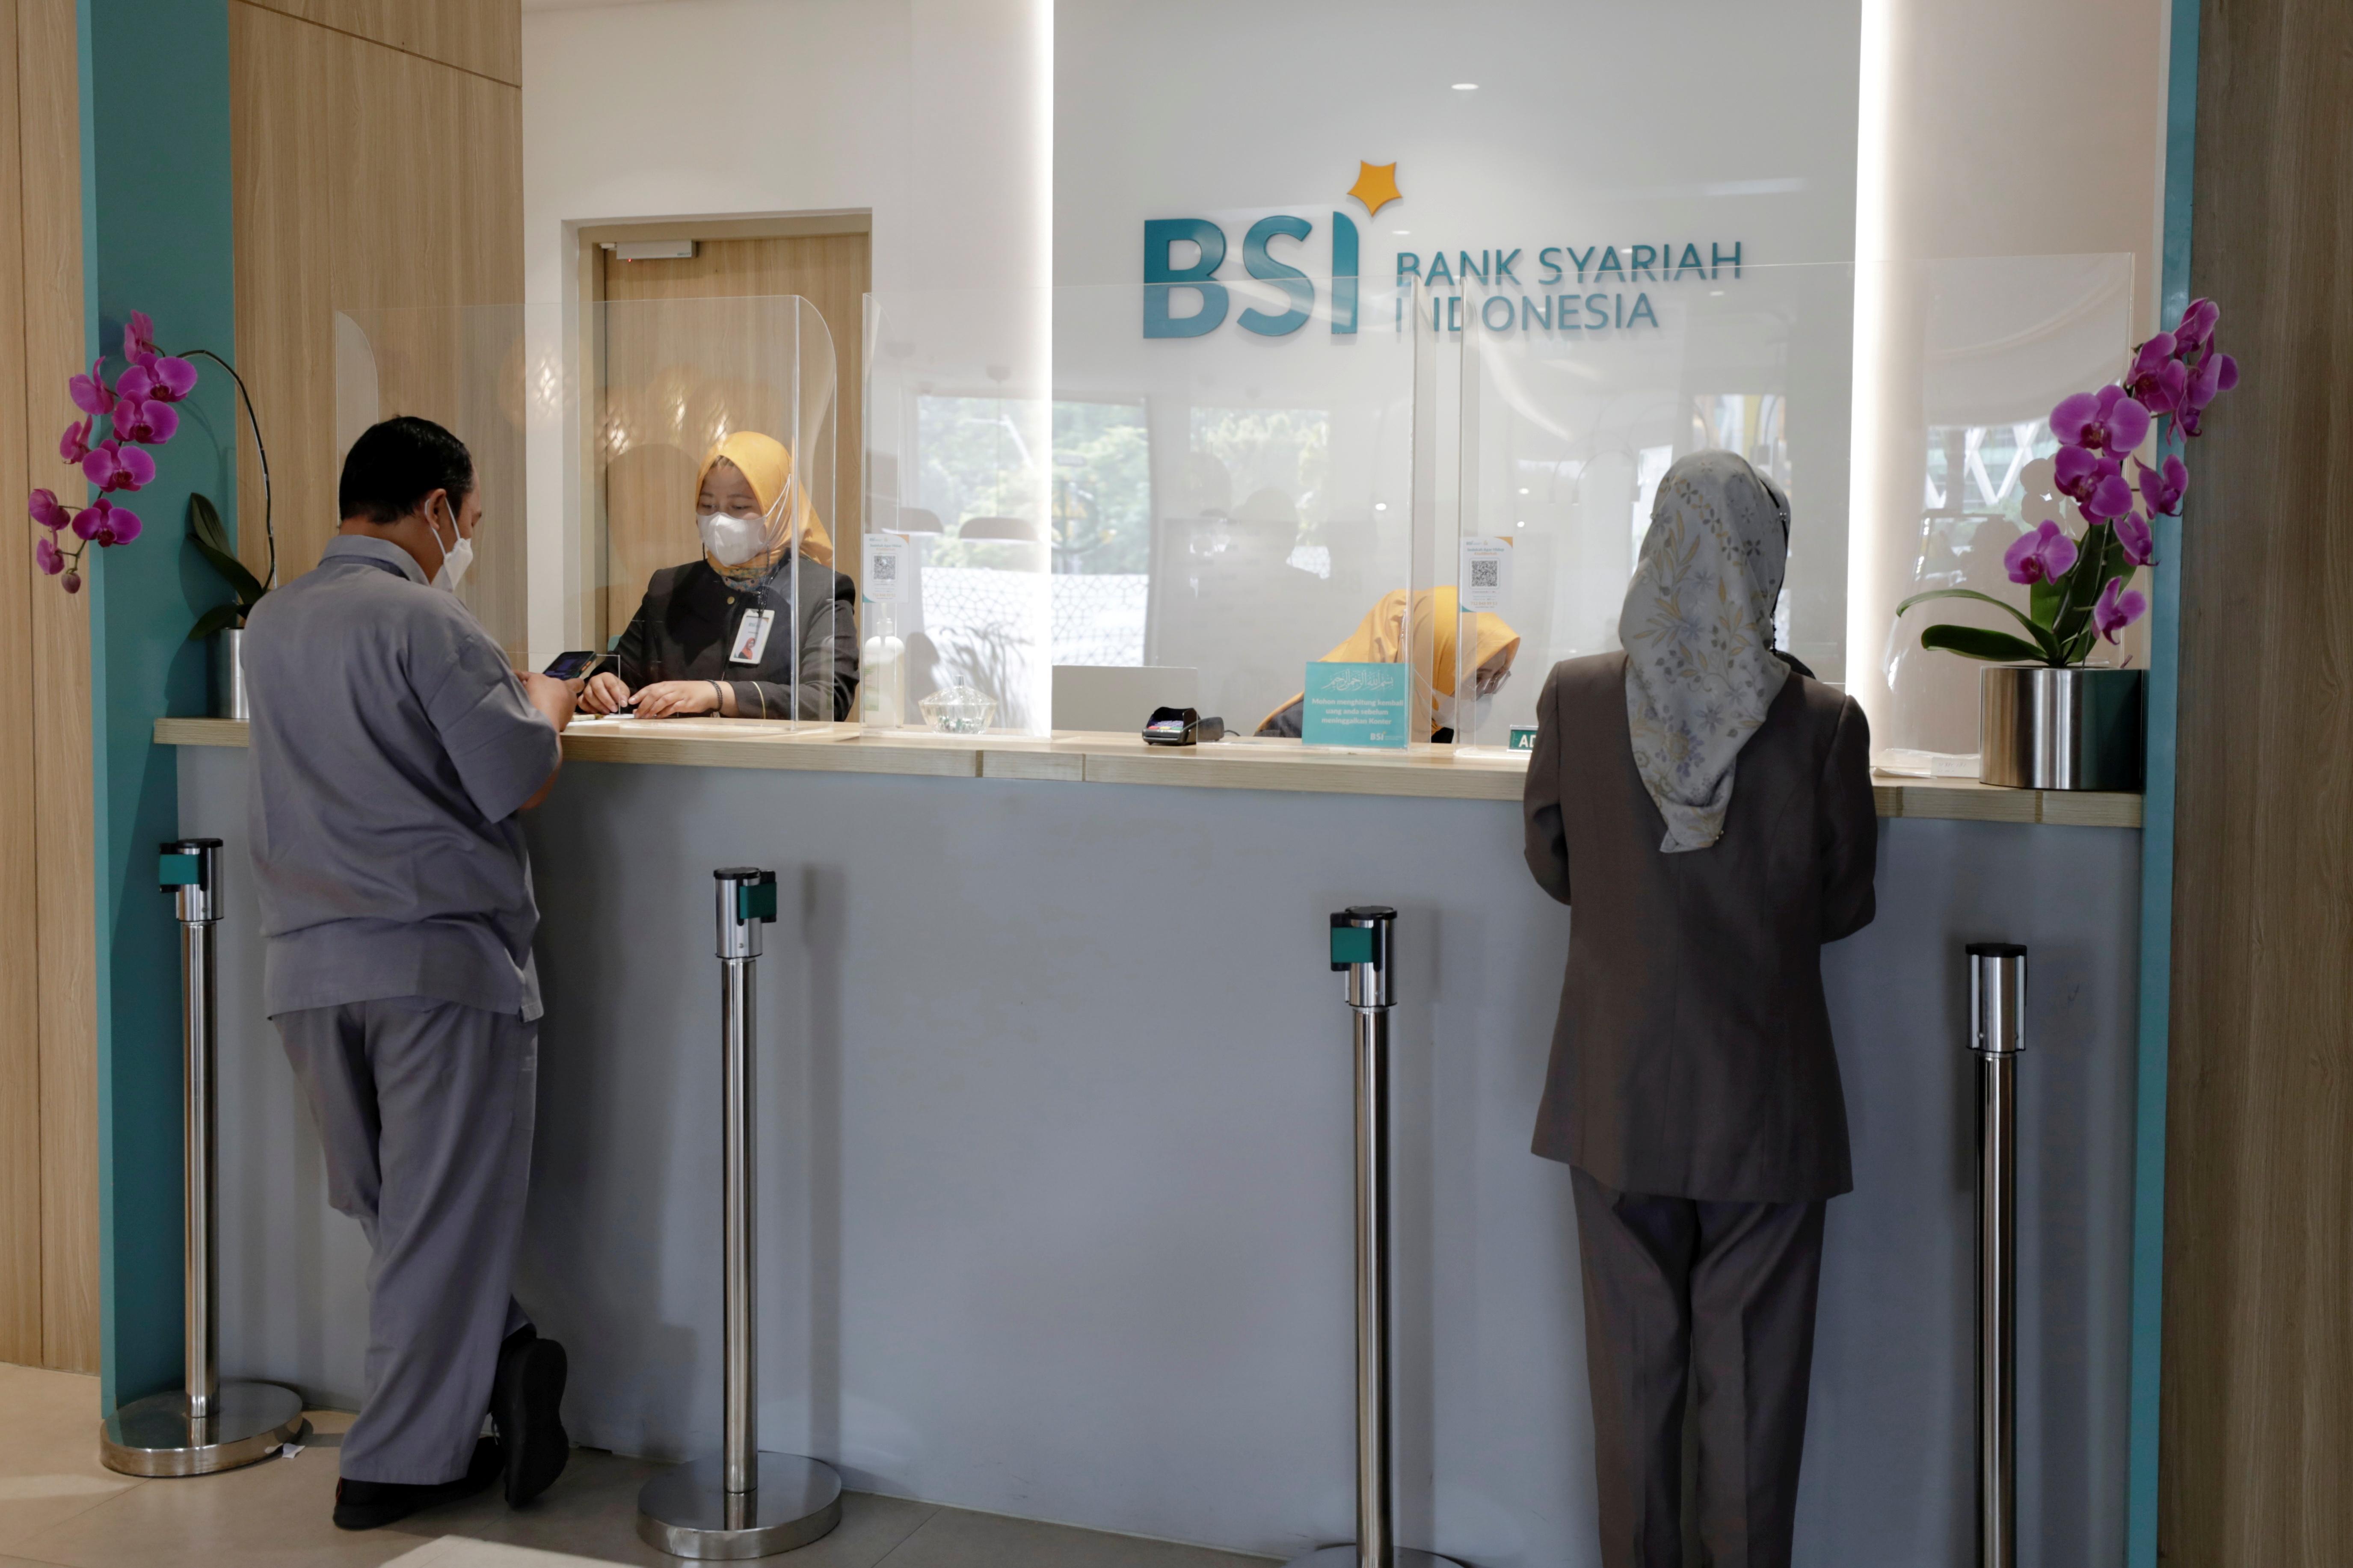 Bank tellers serve customers at Bank Syariah Indonesia in Jakarta, Indonesia, June 8, 2021. REUTERS/Willy Kurniawan/File Photo